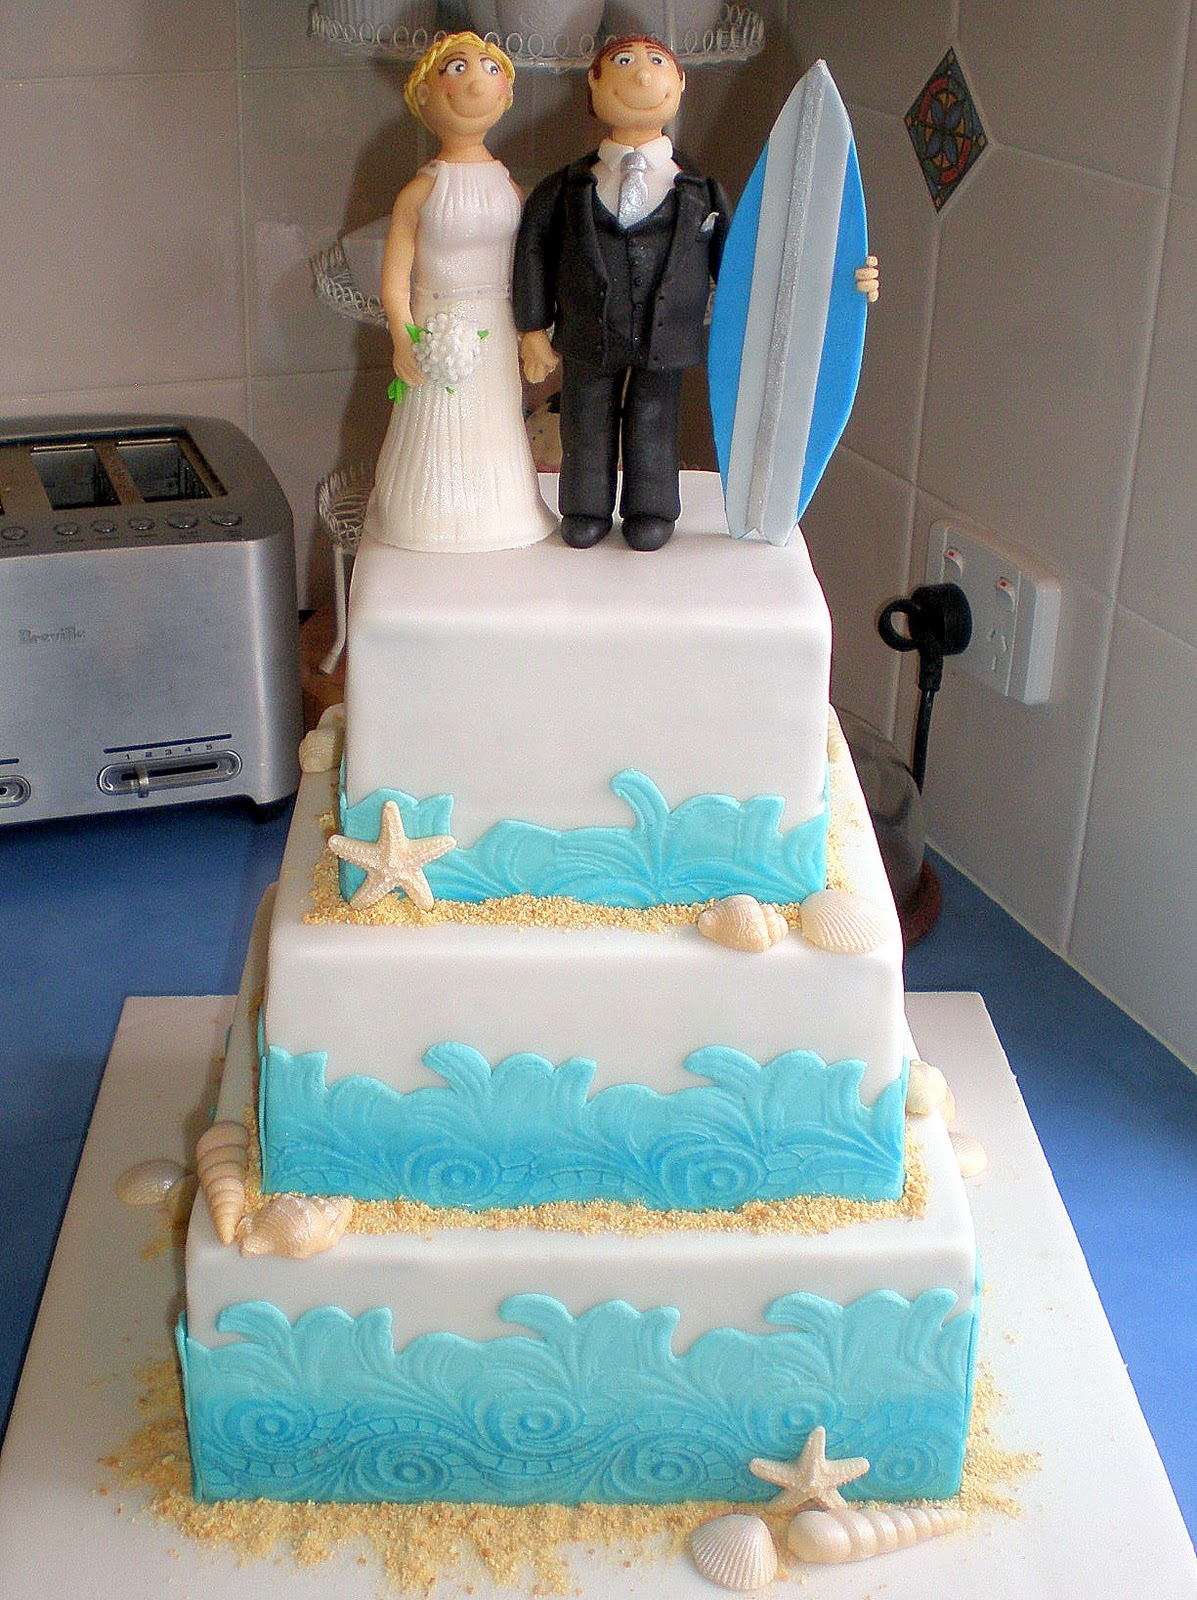 sugar siren cakes mackay beach surfing wedding cake with personalised bride groom toppers. Black Bedroom Furniture Sets. Home Design Ideas